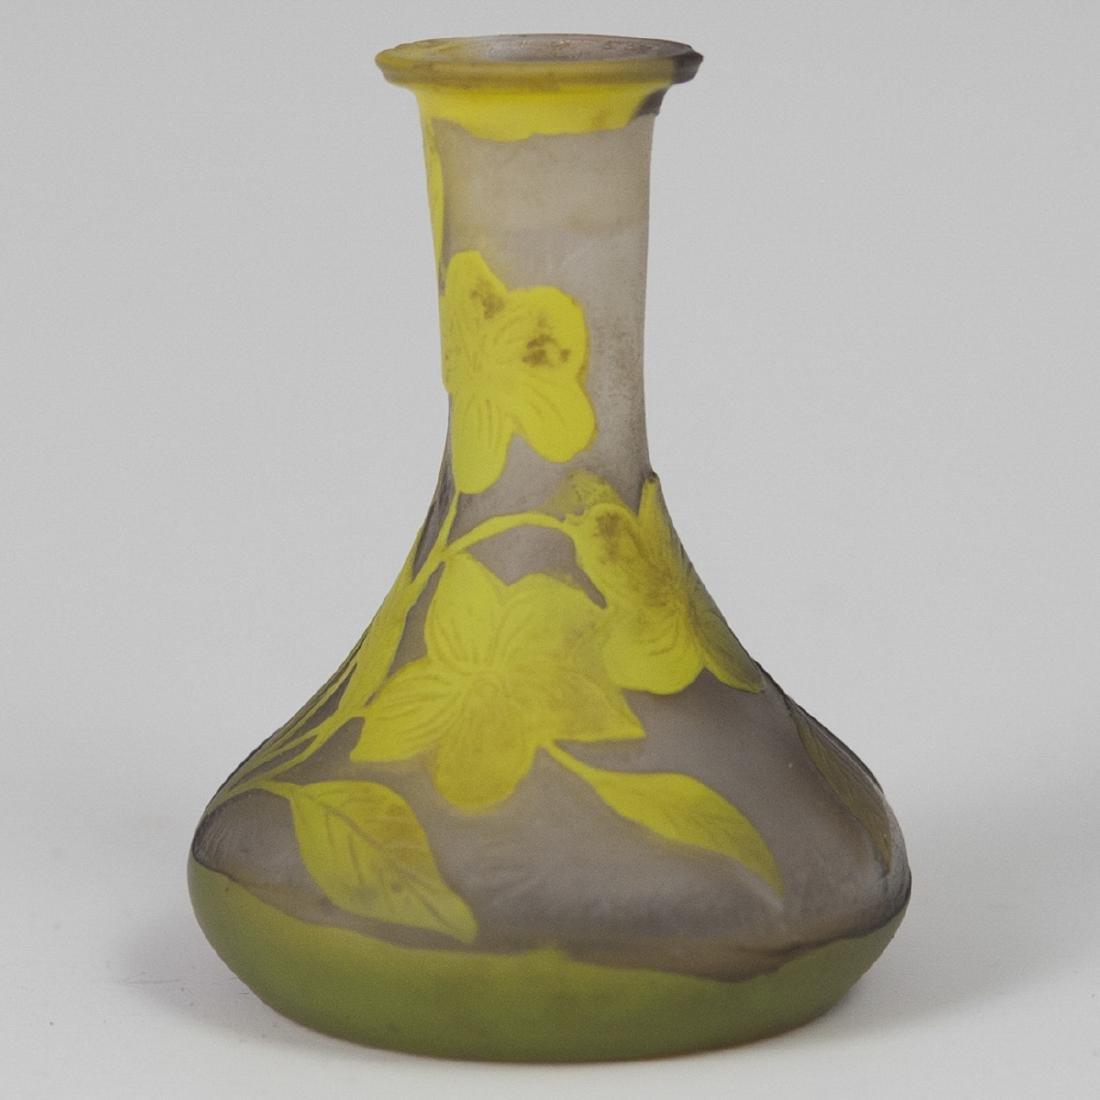 Cameo Glass Diminutive Vase - 2